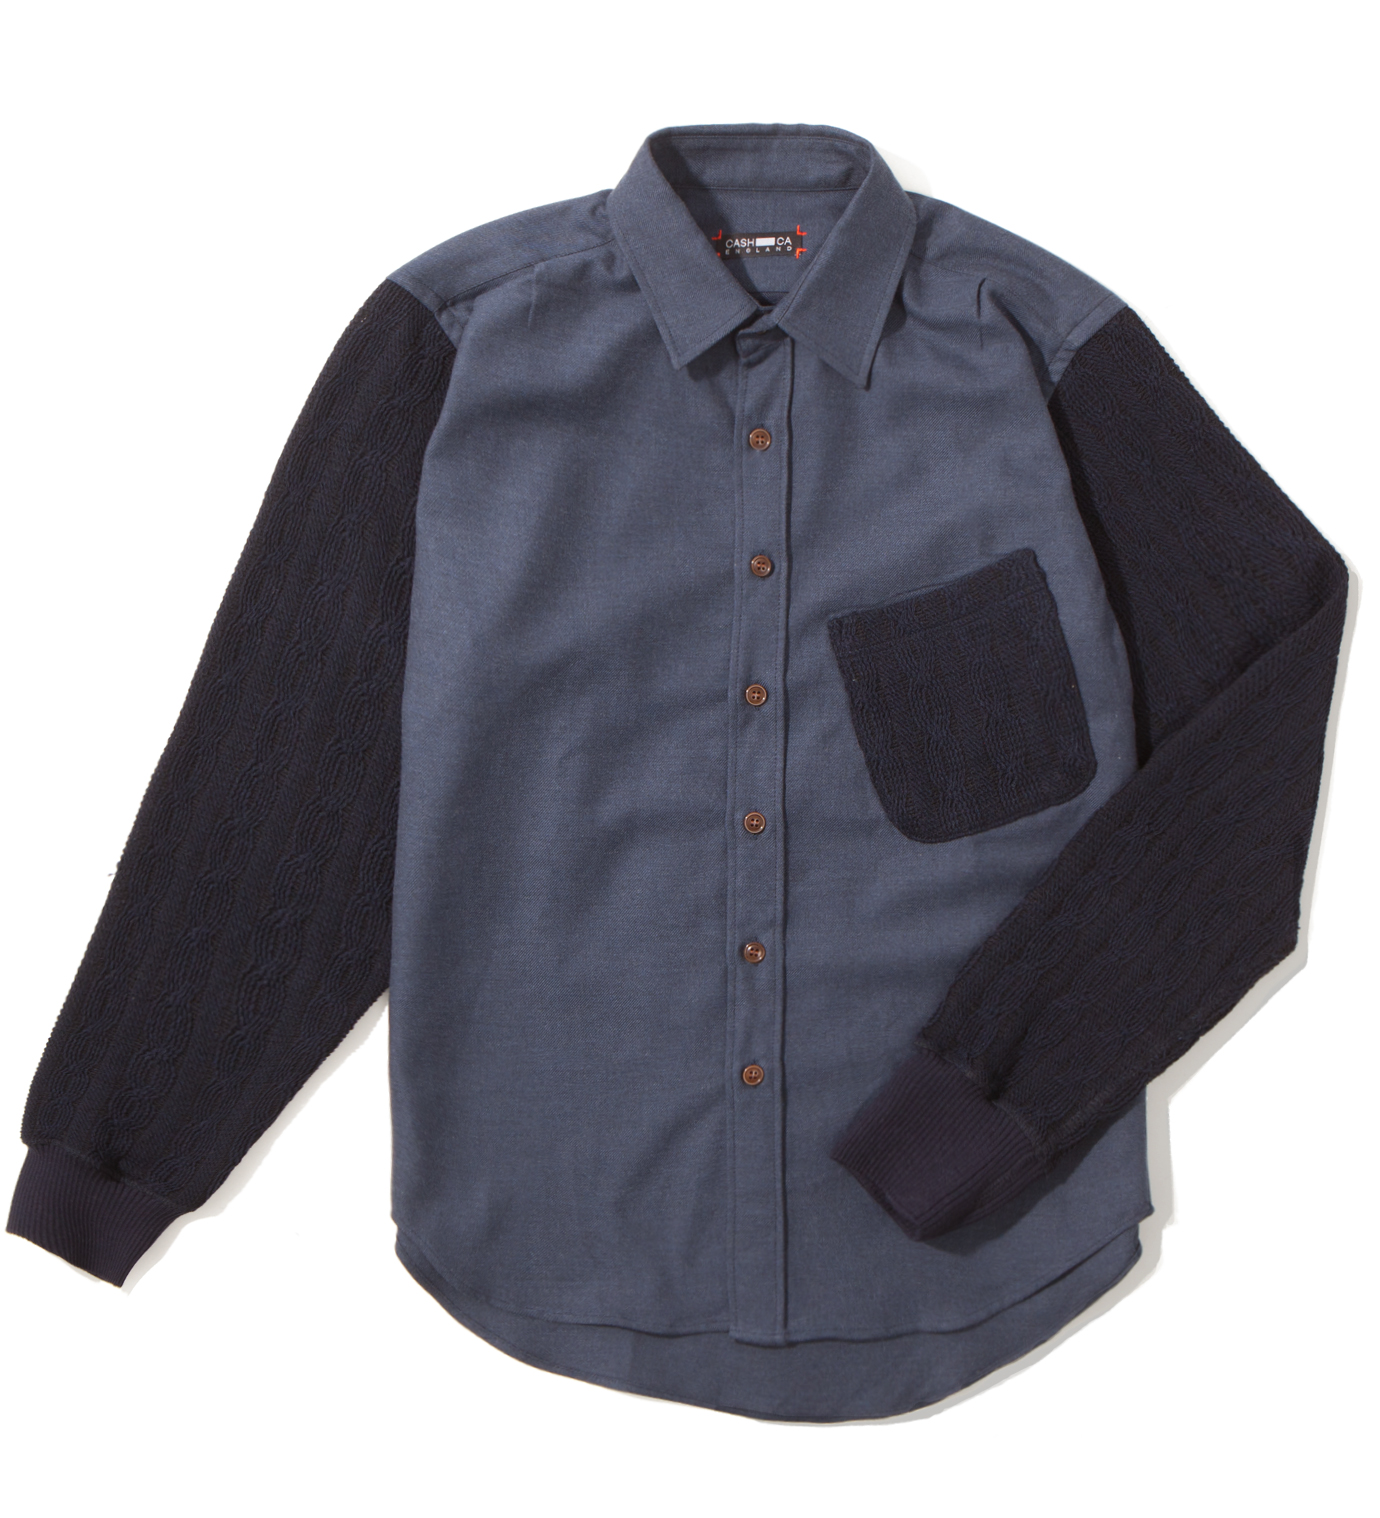 CASH CA Navy Knit Sleeve Shirt